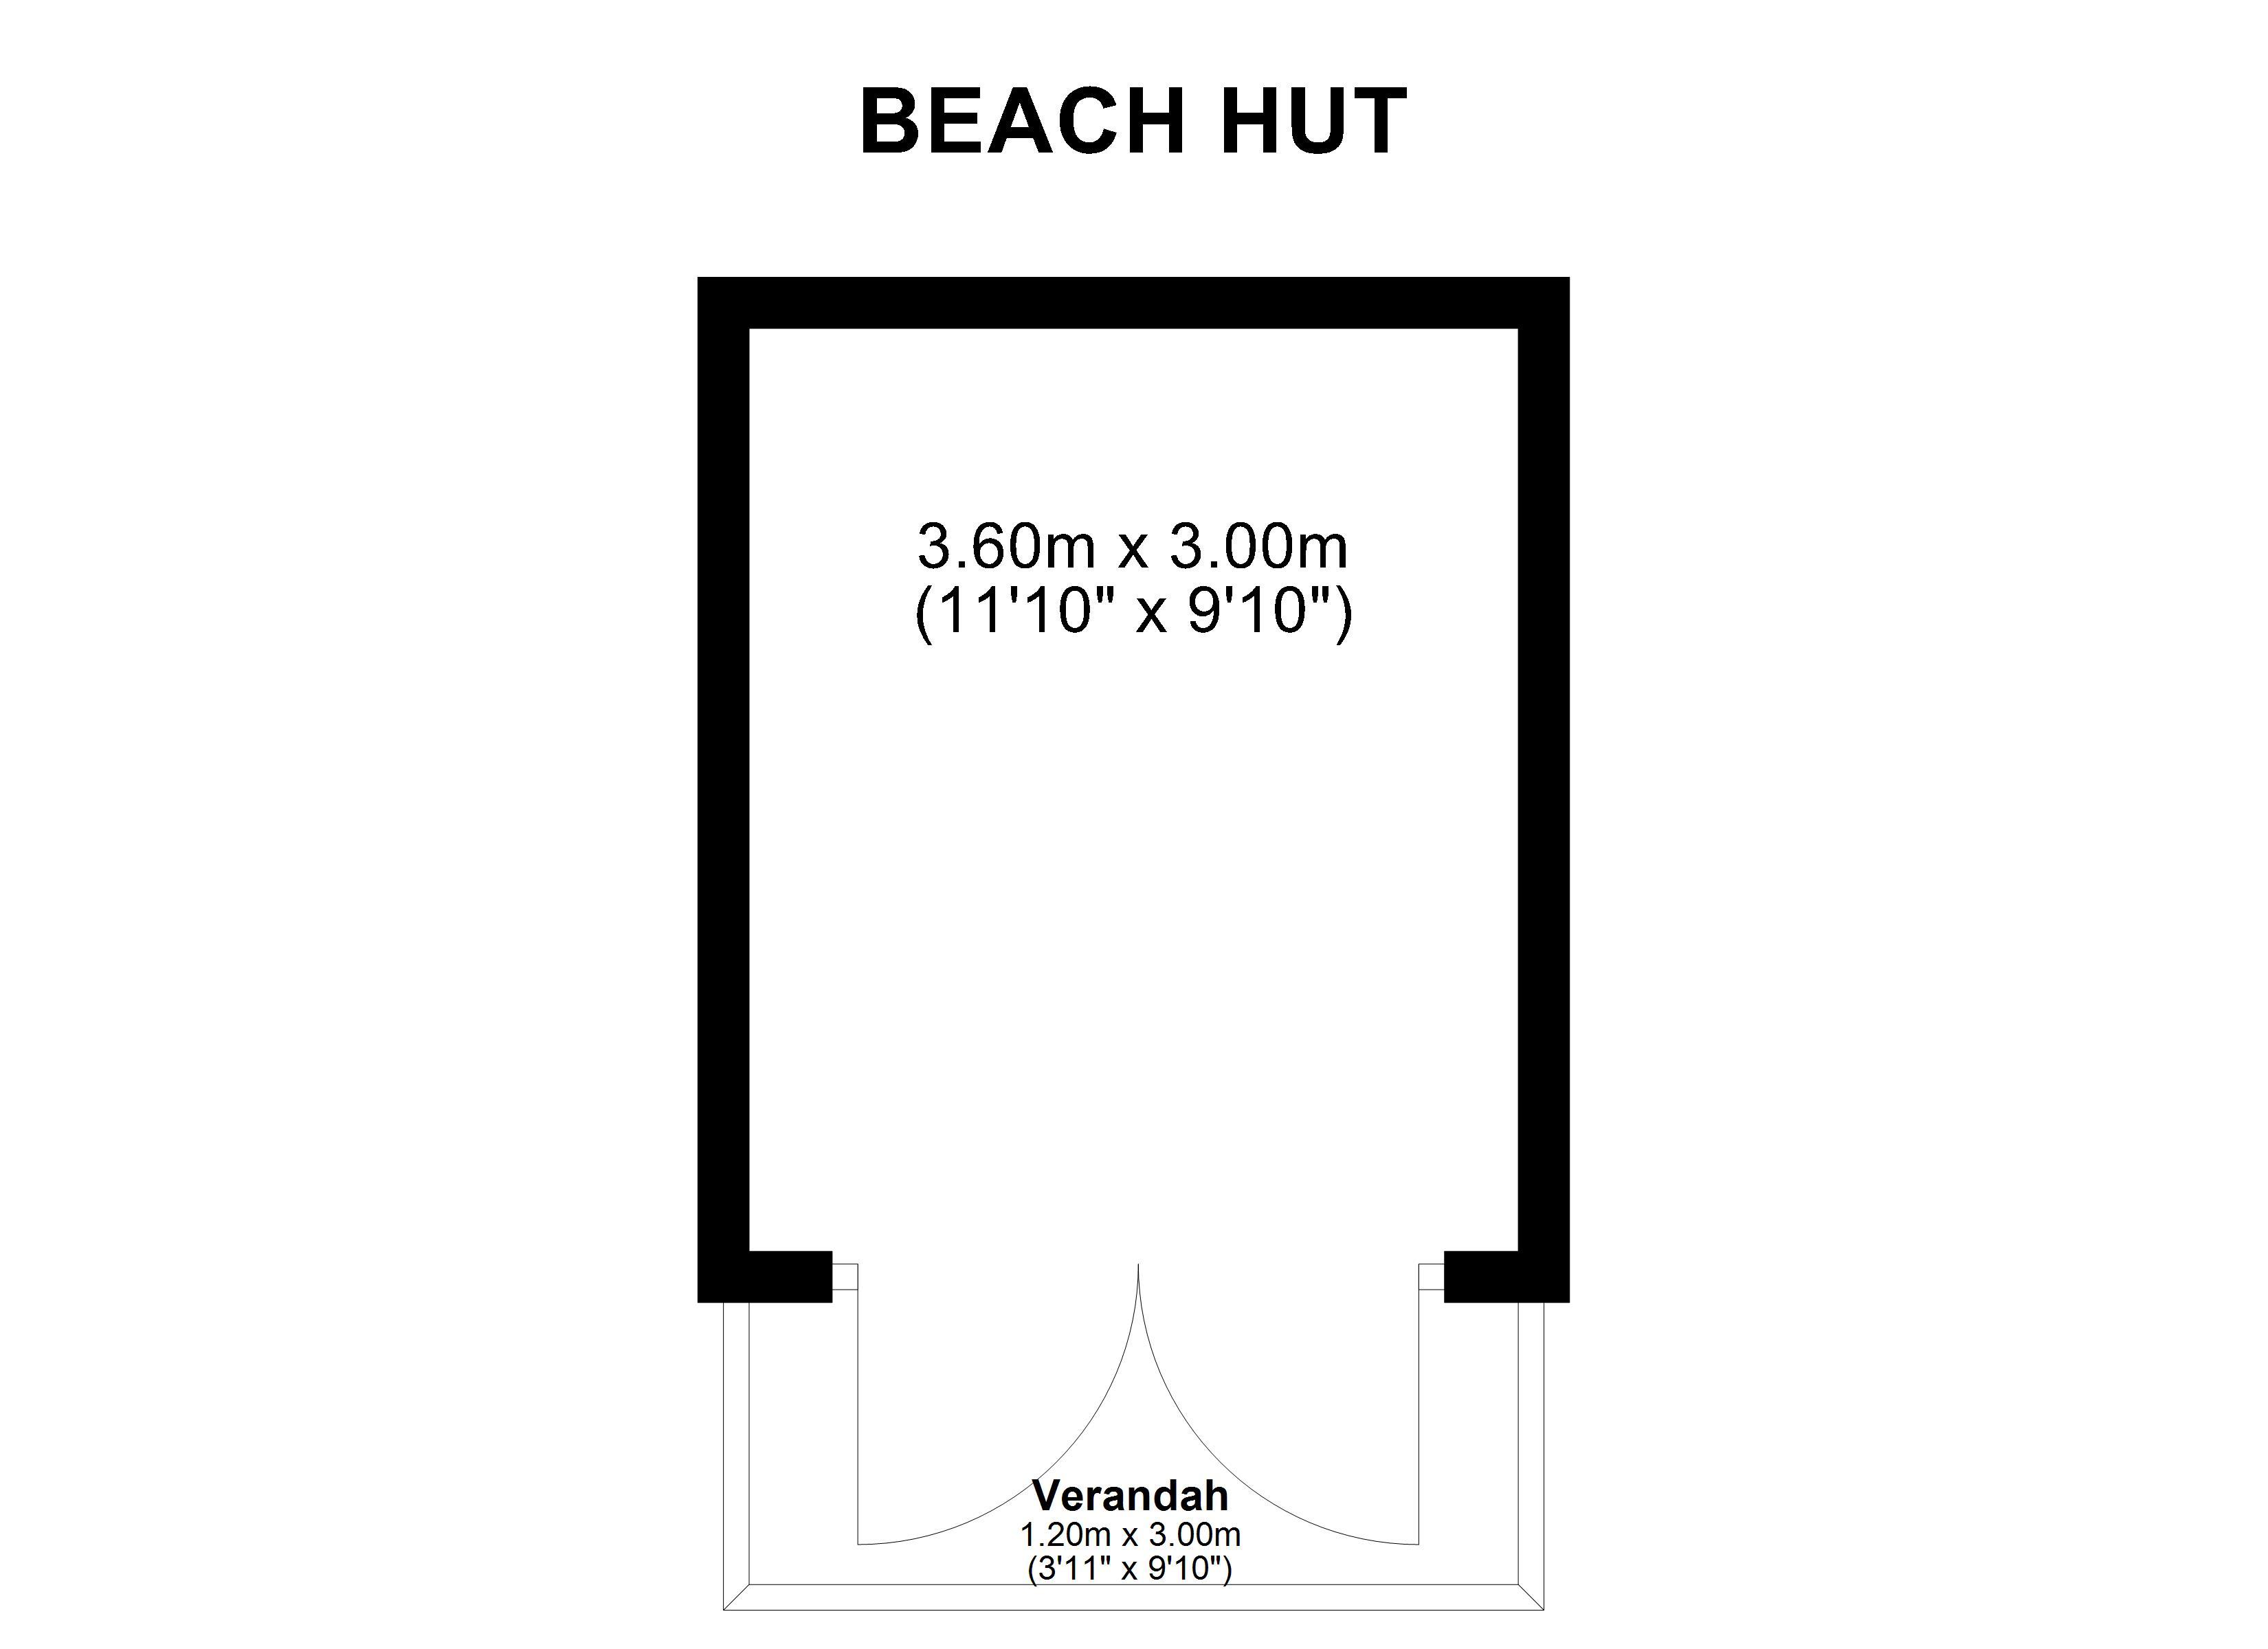 UK Beach huts. Bespoke Beach Huts made in Norfolk. Beach